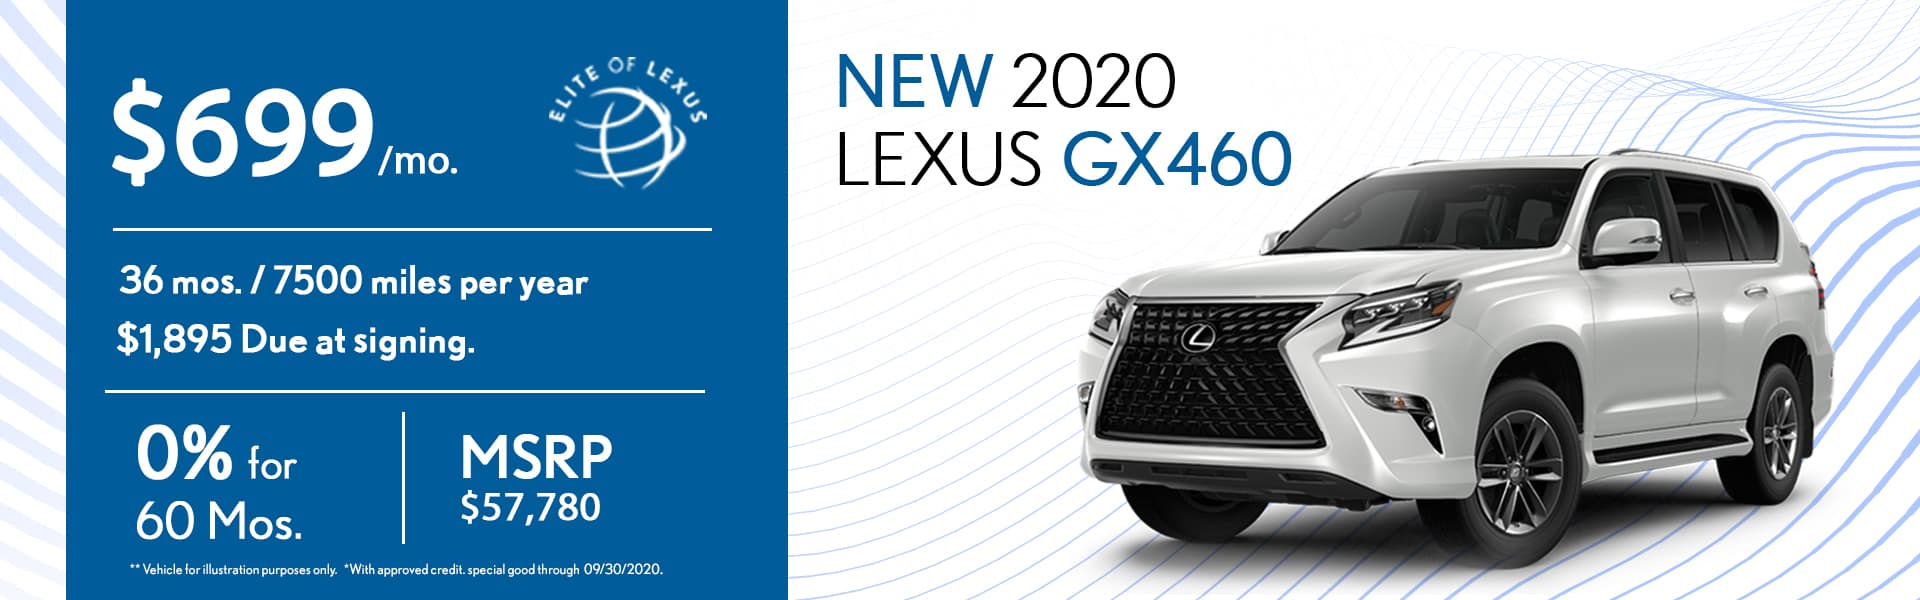 2020 Lexus GX460 special